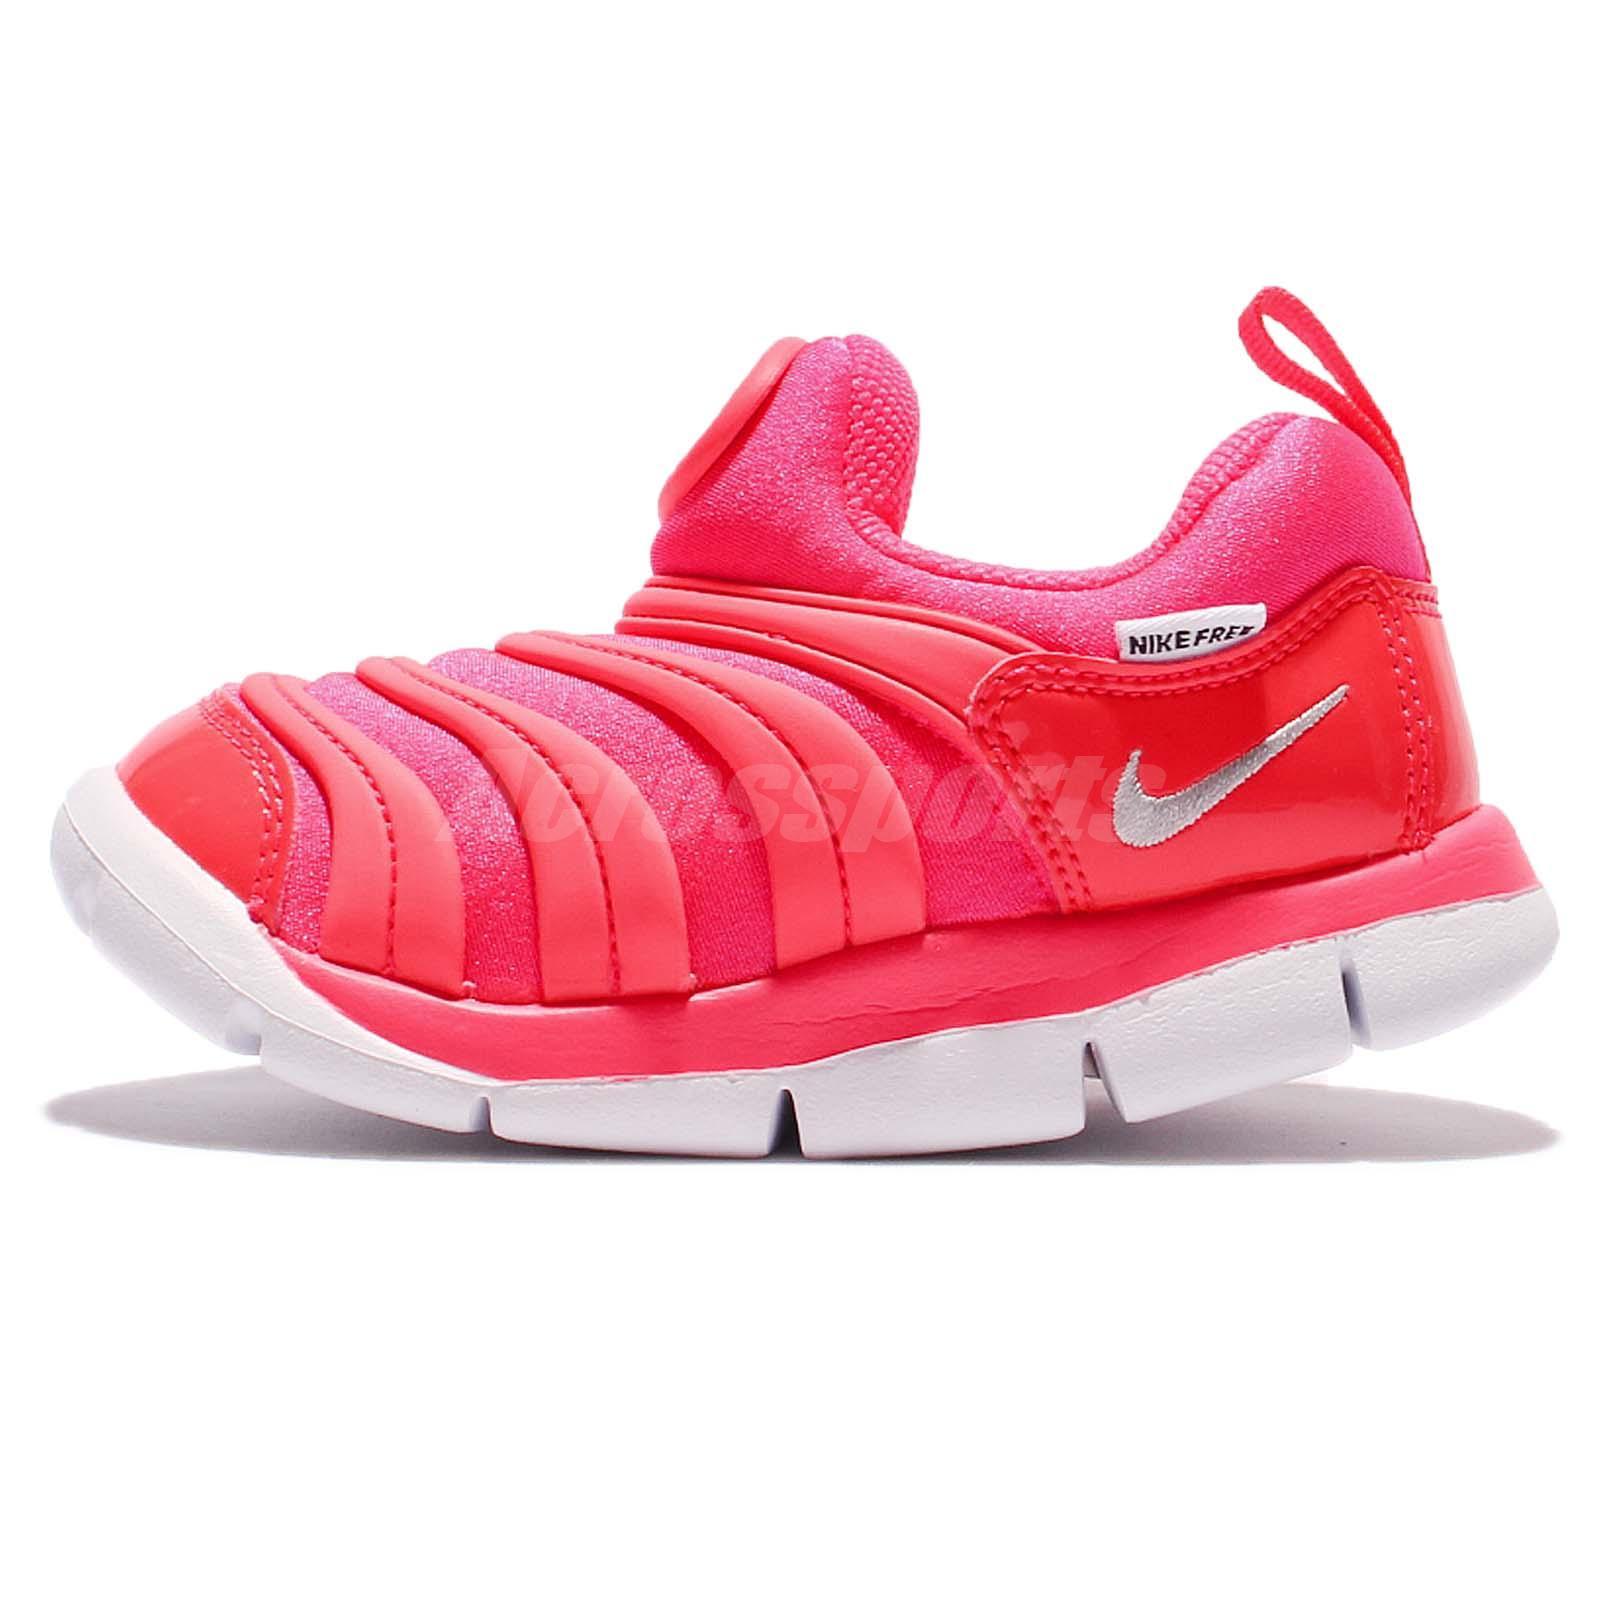 Nike Dynamo Free TD Toddler Infant Kids Baby Pink Prewalkers Shoes